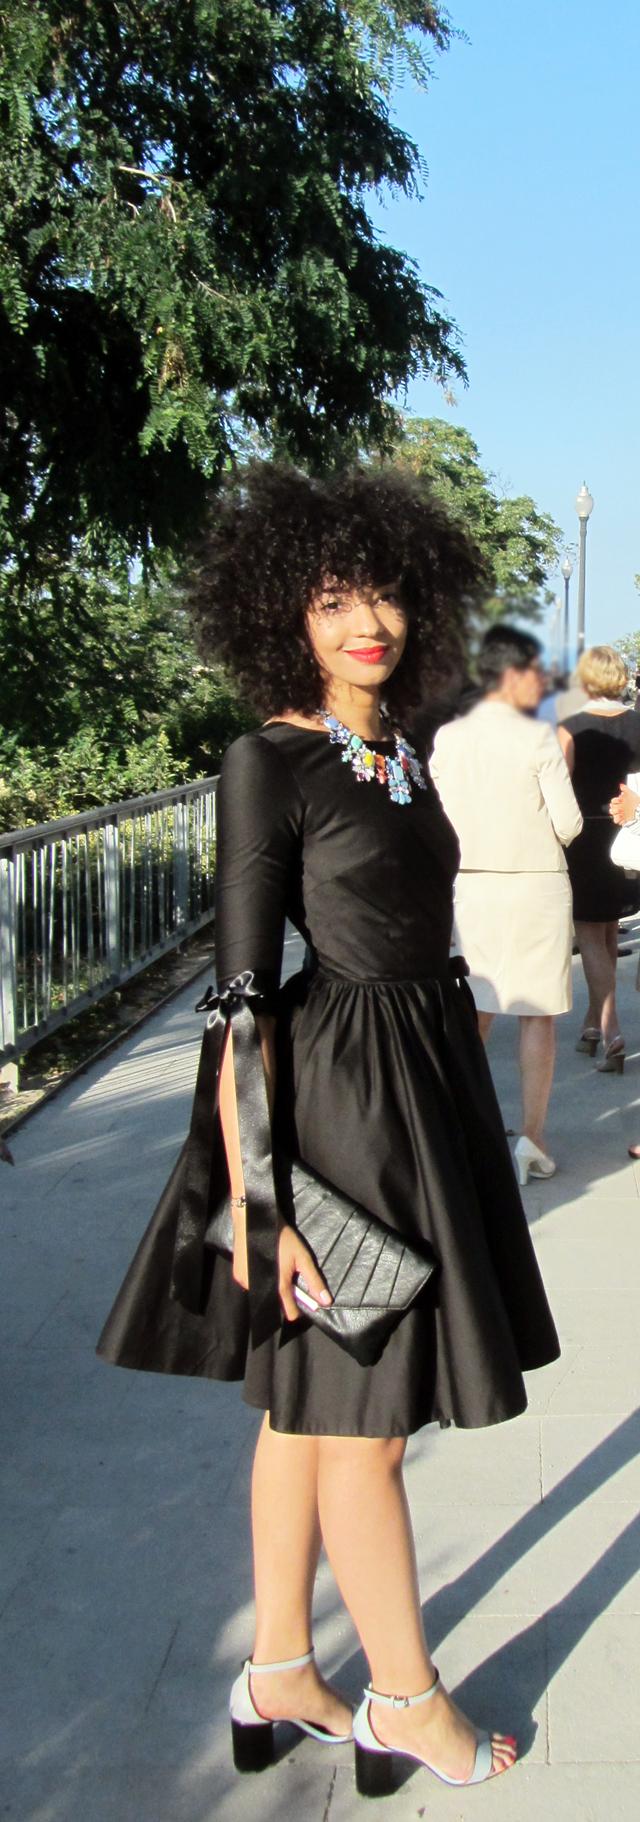 mercredie-blog-mode-geneve-idees-tenues-robes-mariage-delphine-manivet-pour-la-redoute-satin-noire-noeud